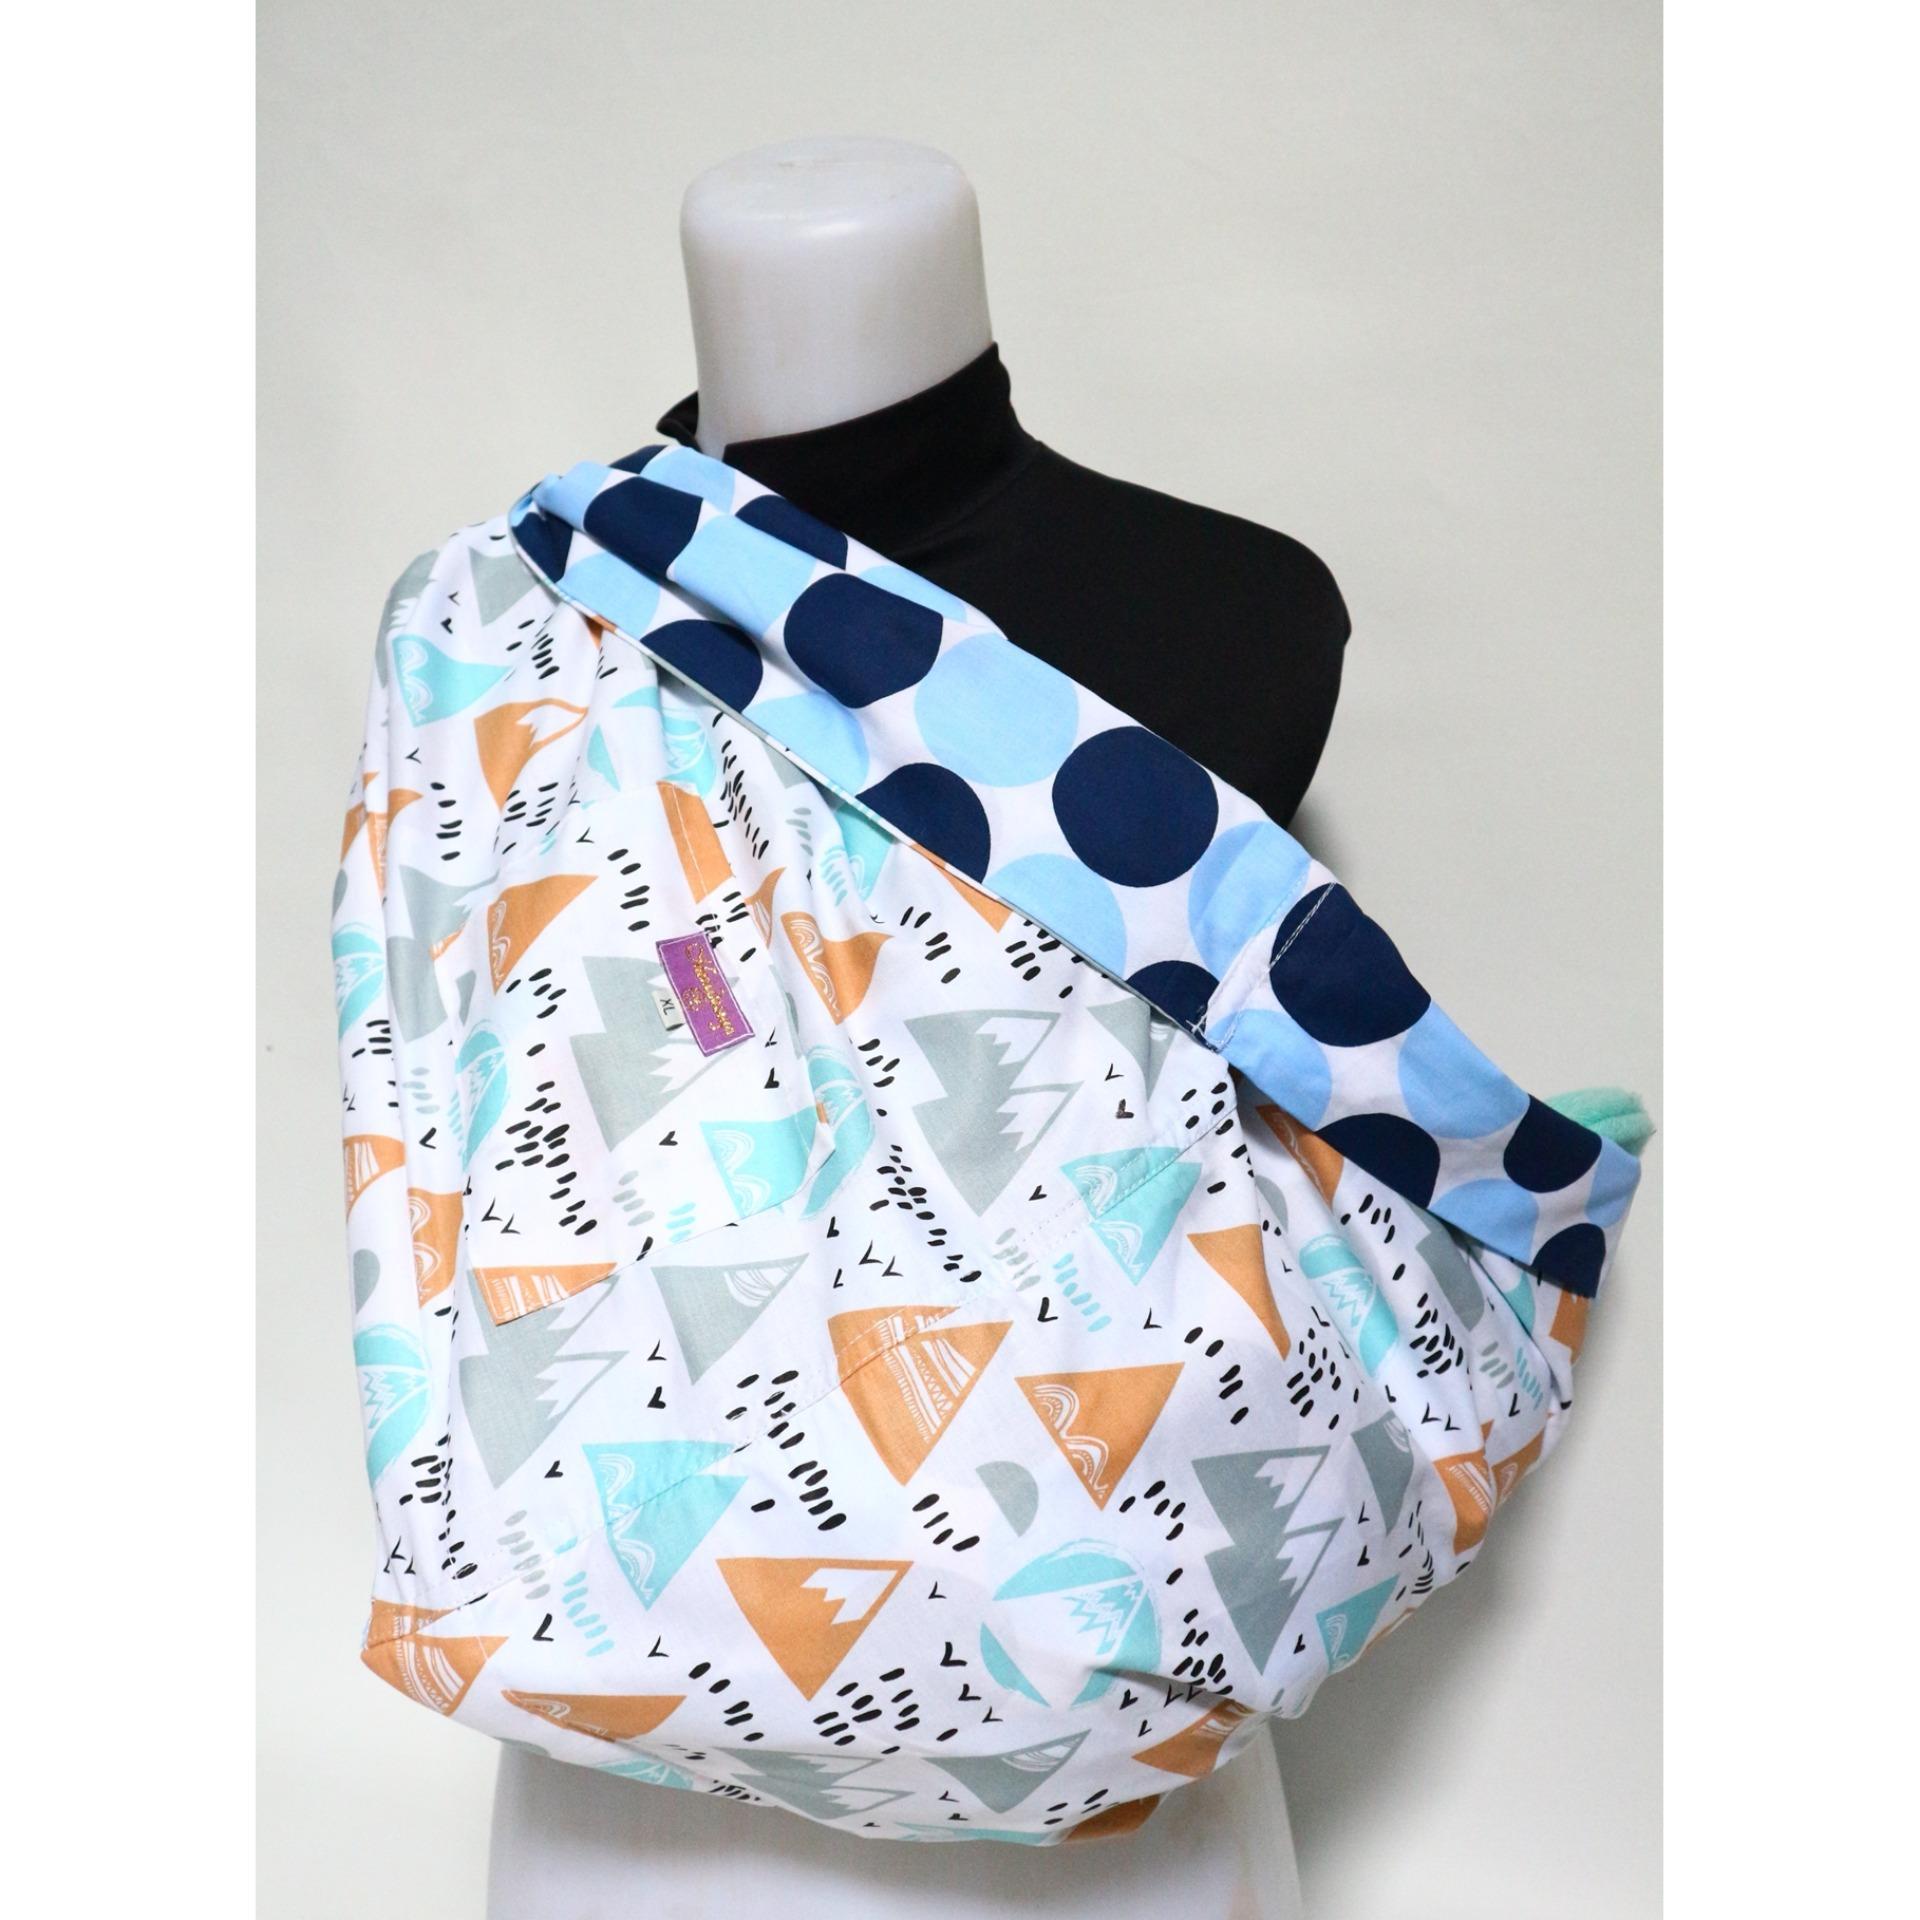 Beli Gendongan Bayi Sling Bolak Balik Katun Instan Premium Size M Dan Xl Baru